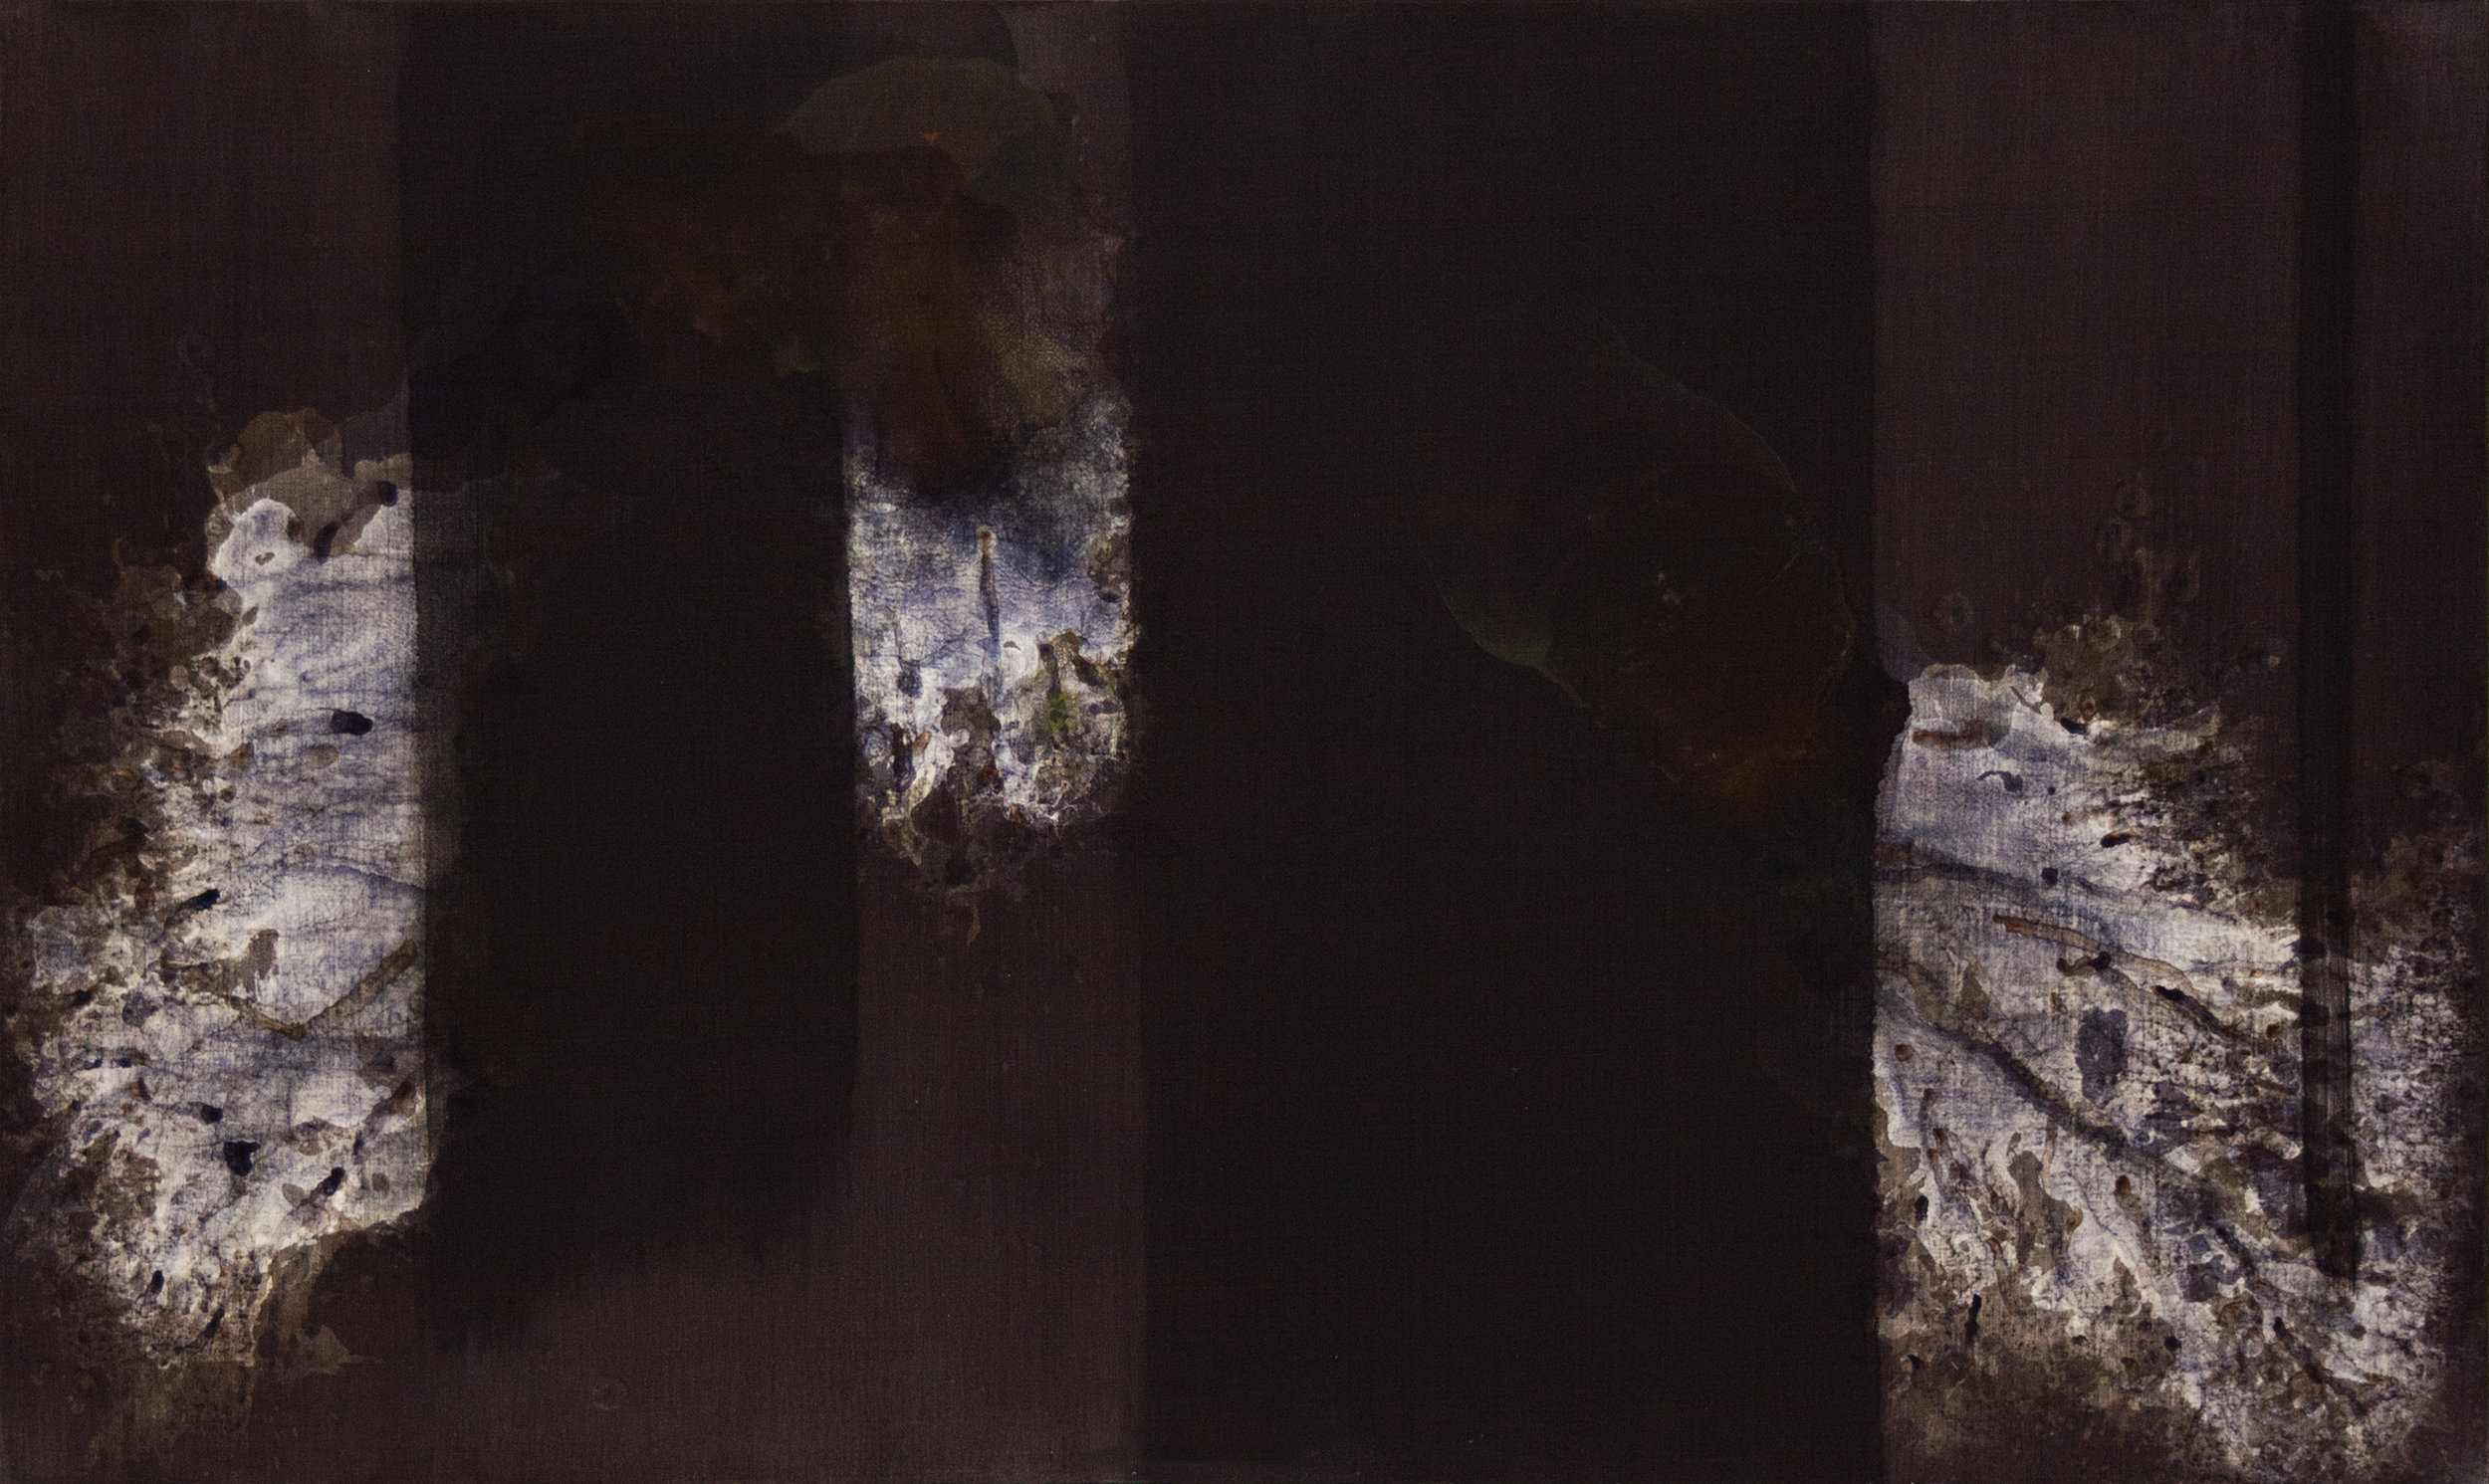 Shaun C. Whiteside  Elegy to the U.S. Republic no. 5 (after Motherwell),  Acrylic